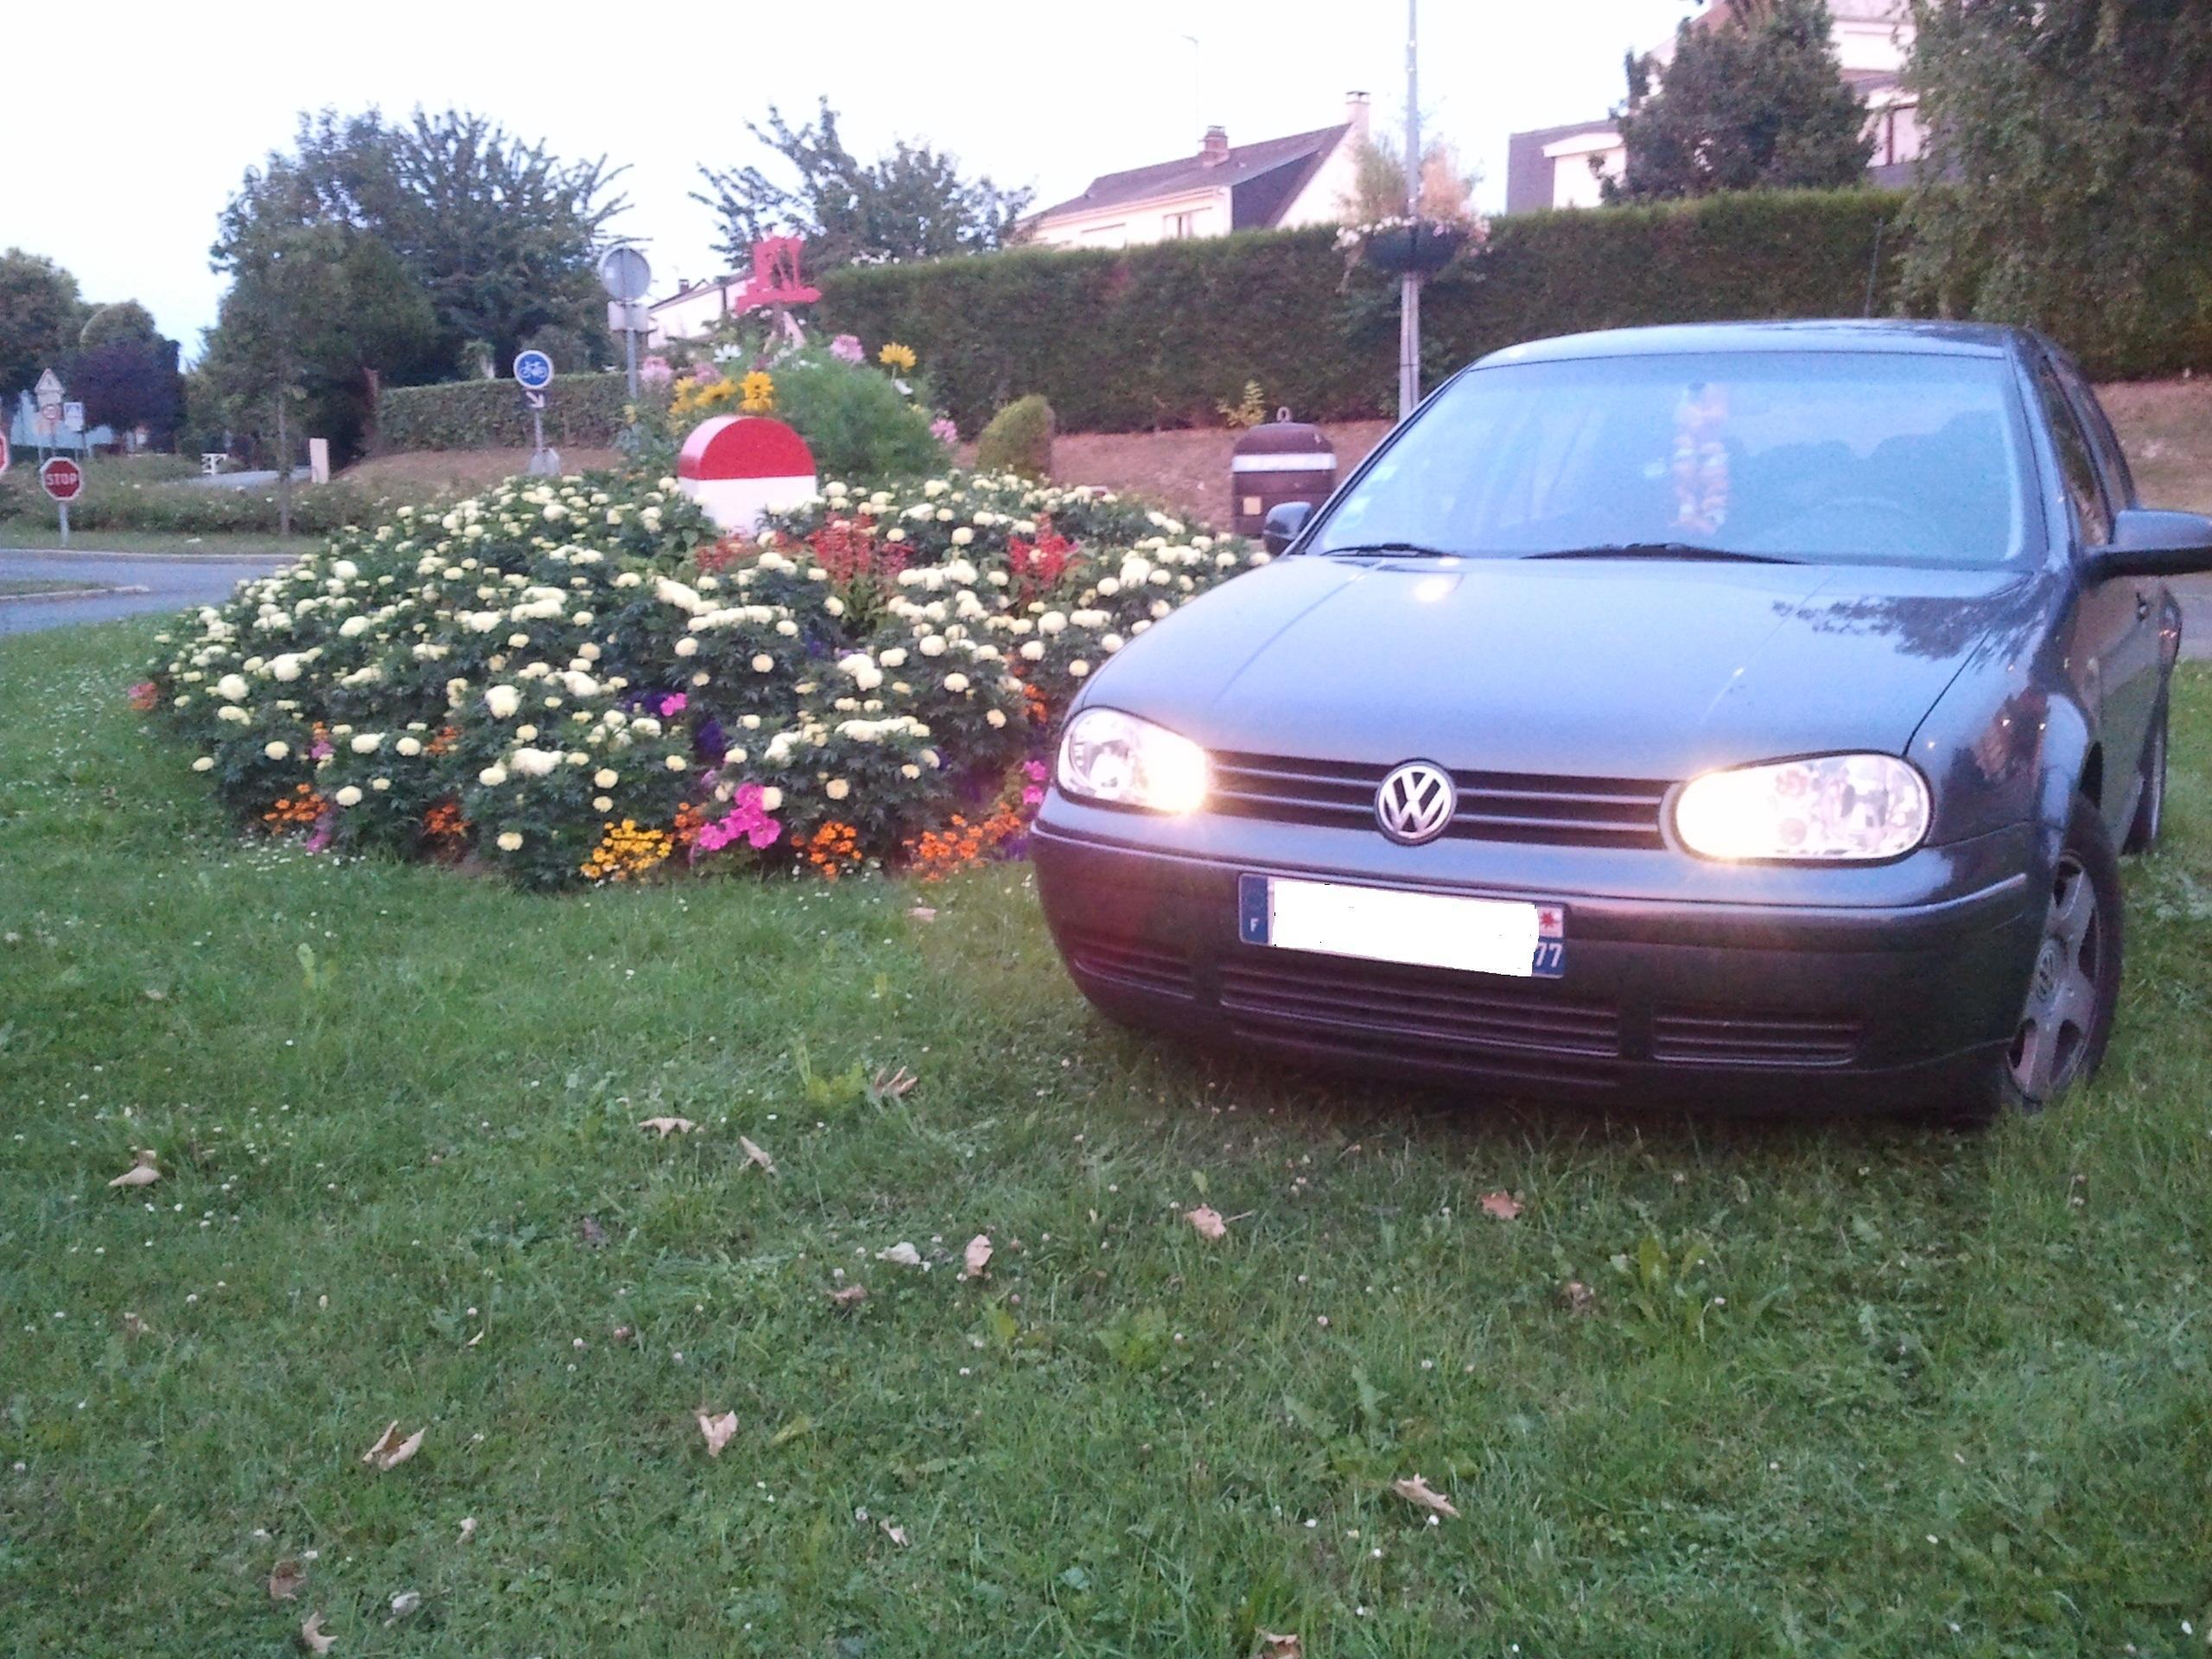 Golf 4 tdi 110 confort de grincheu78 besoin aide p2 for Trouver un garage volkswagen